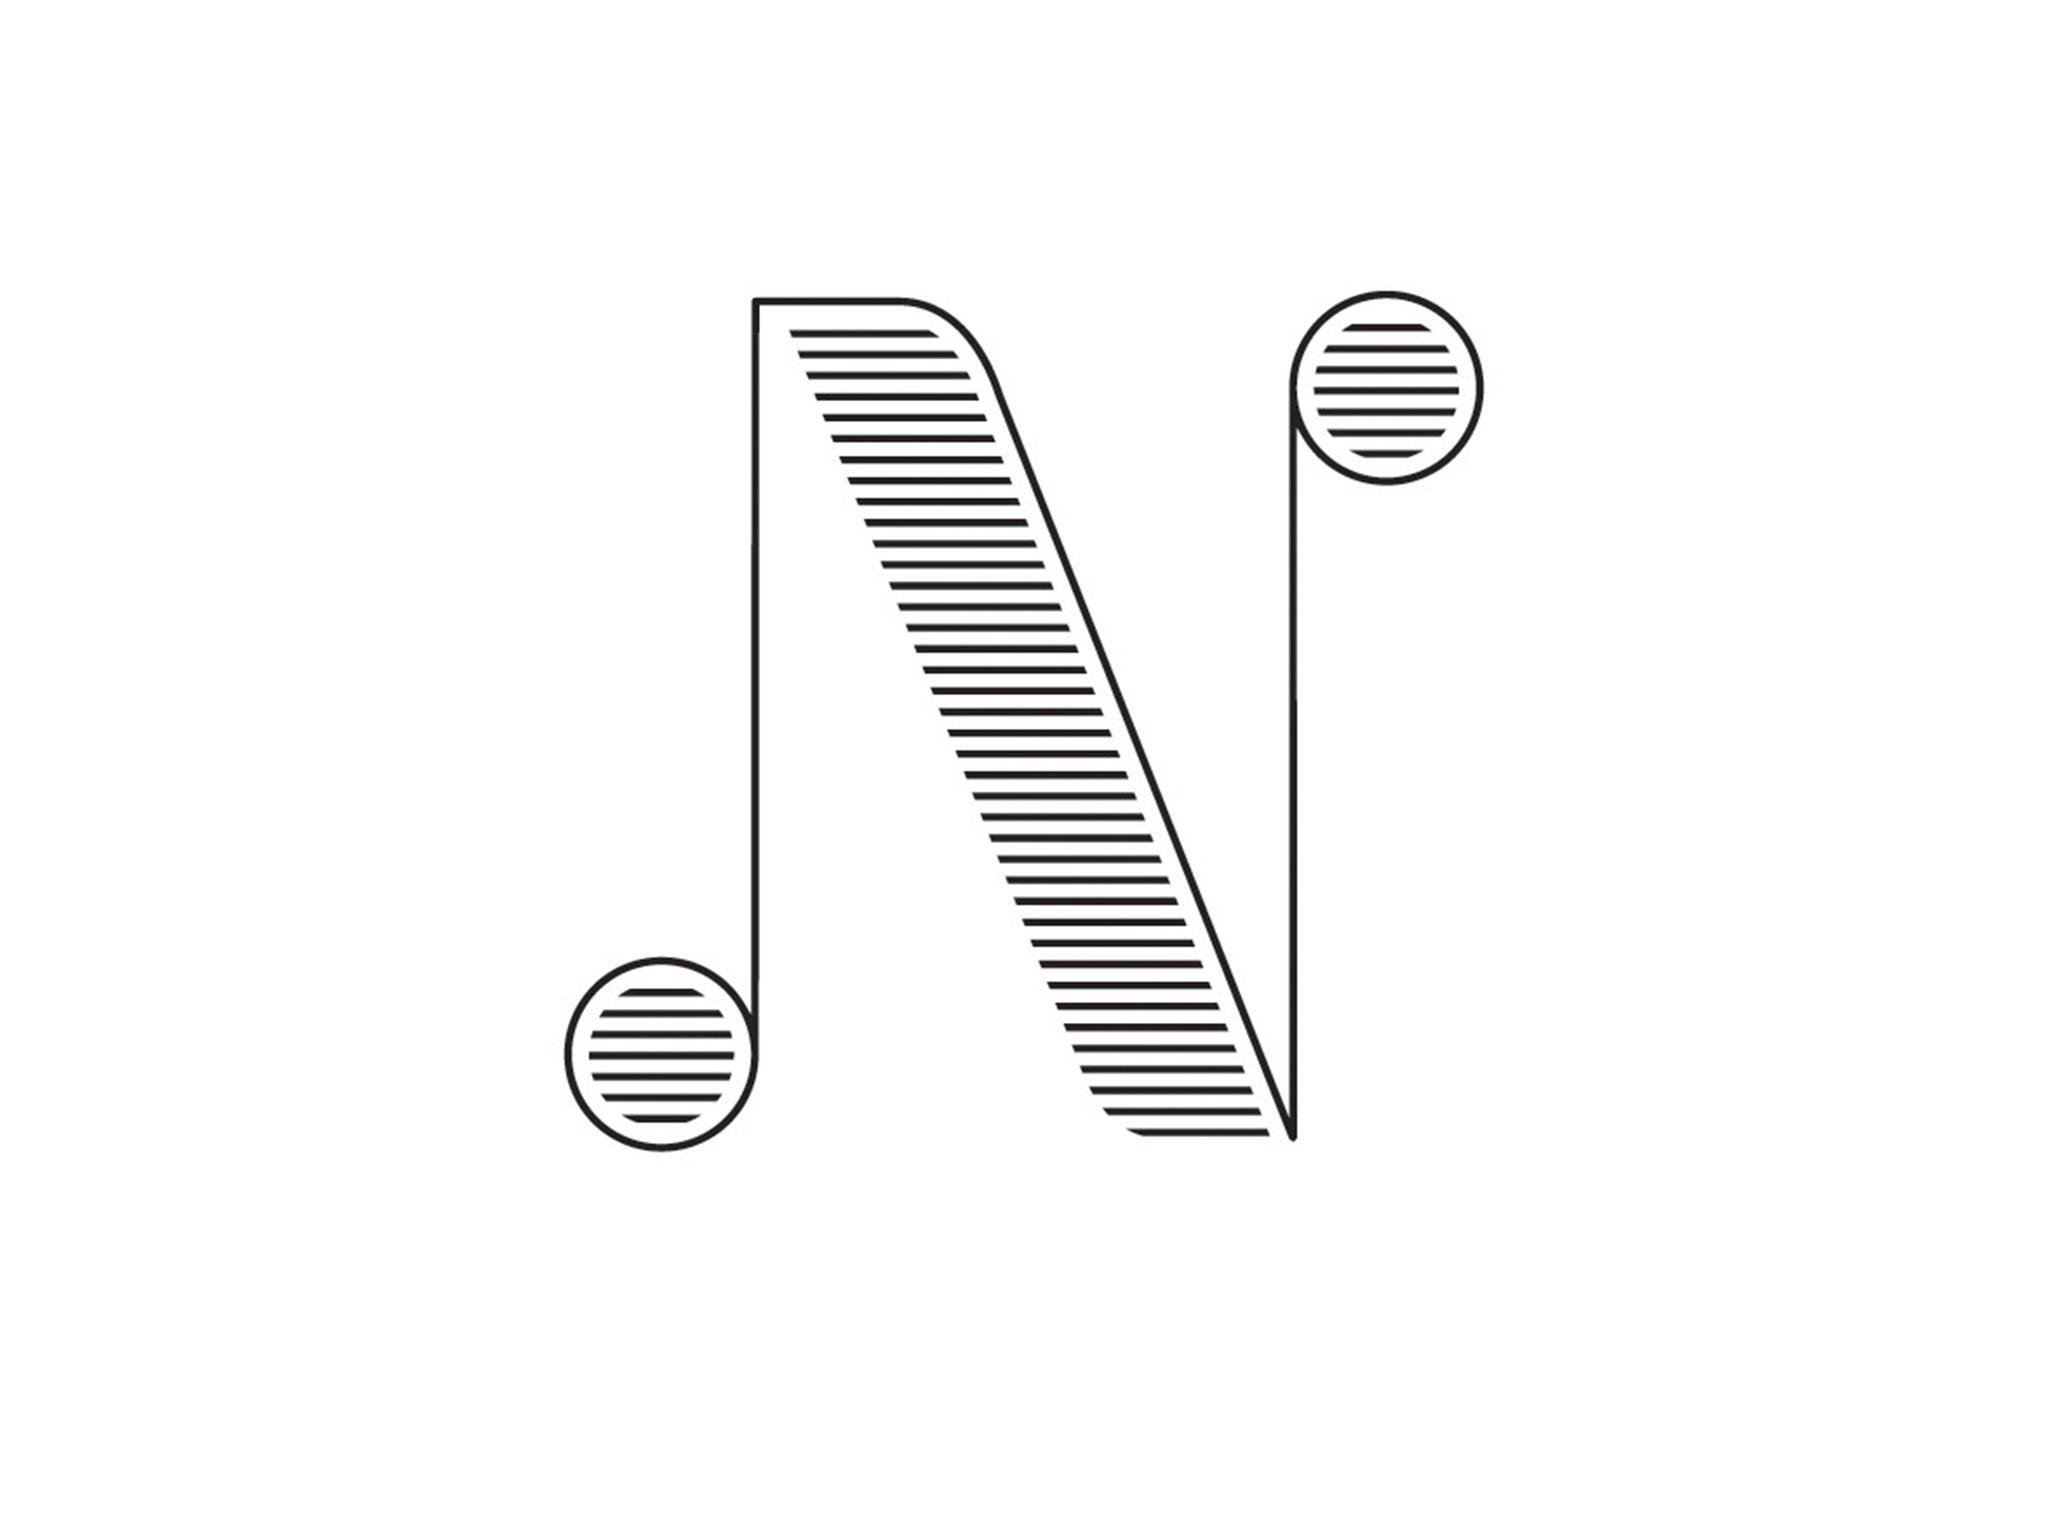 apex_letters_horizontal_large_0026_2_final_alphabet coasters-14.jpg